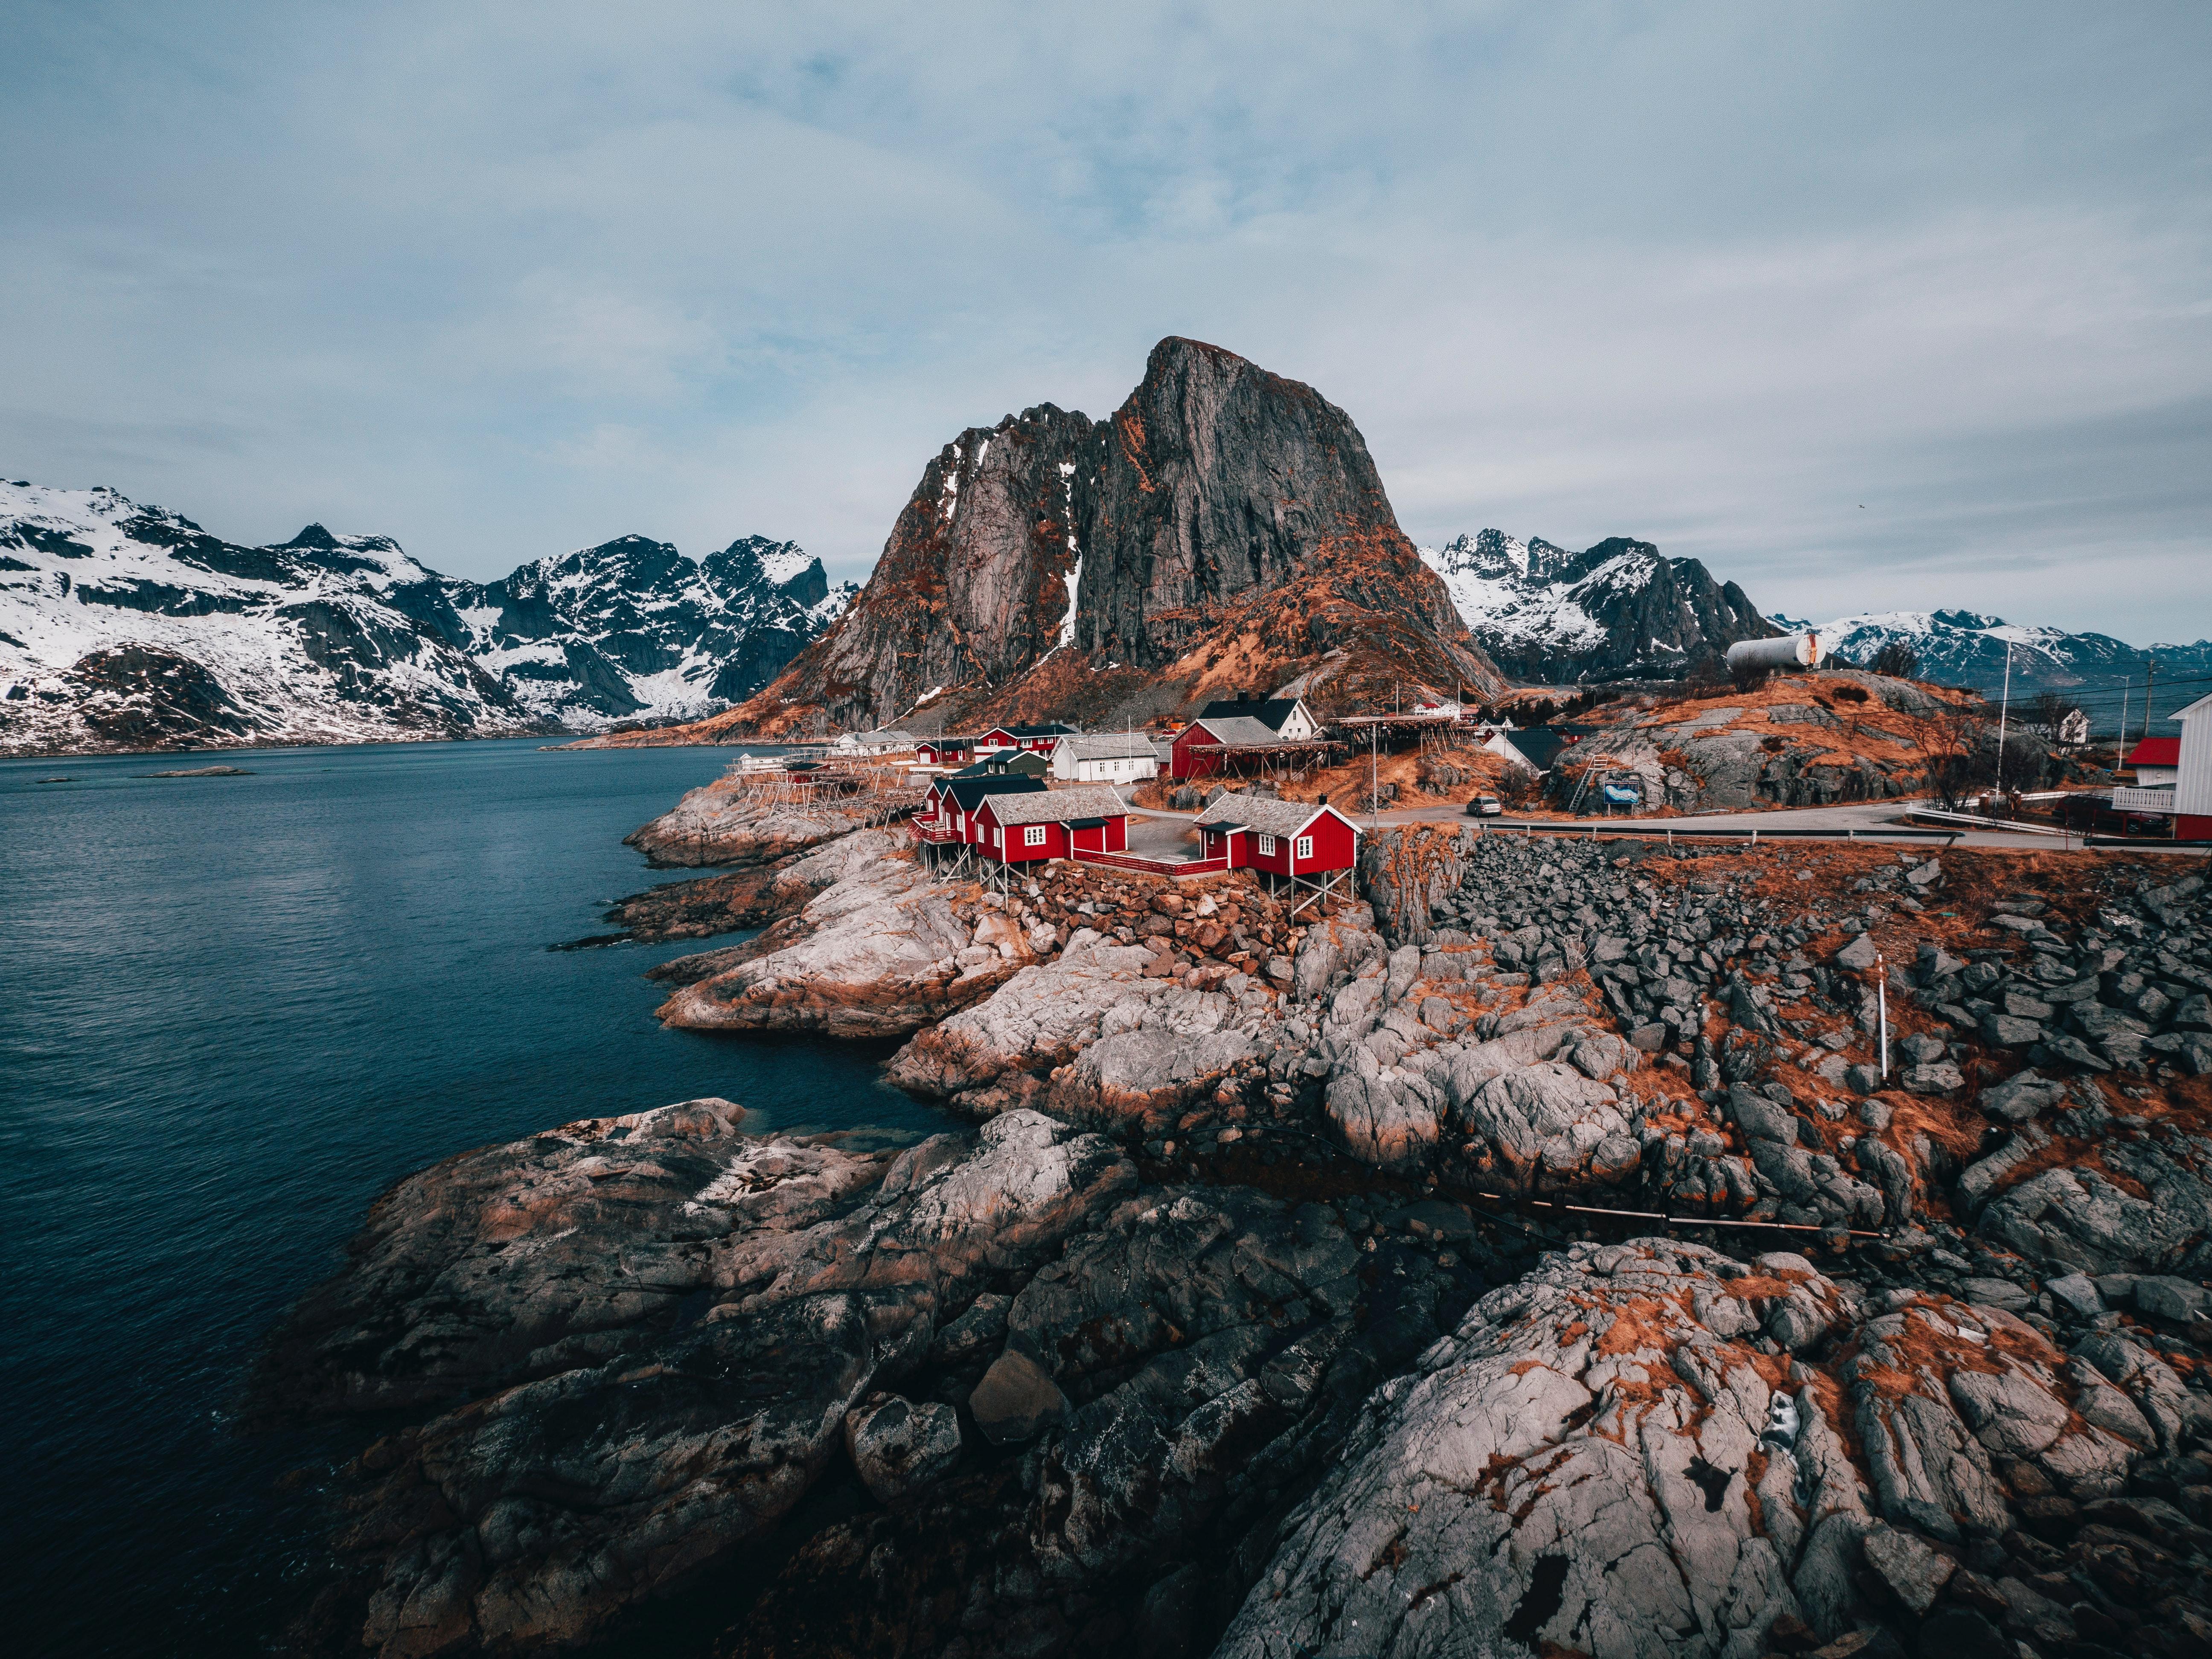 Norway Photo by John O'Nolan